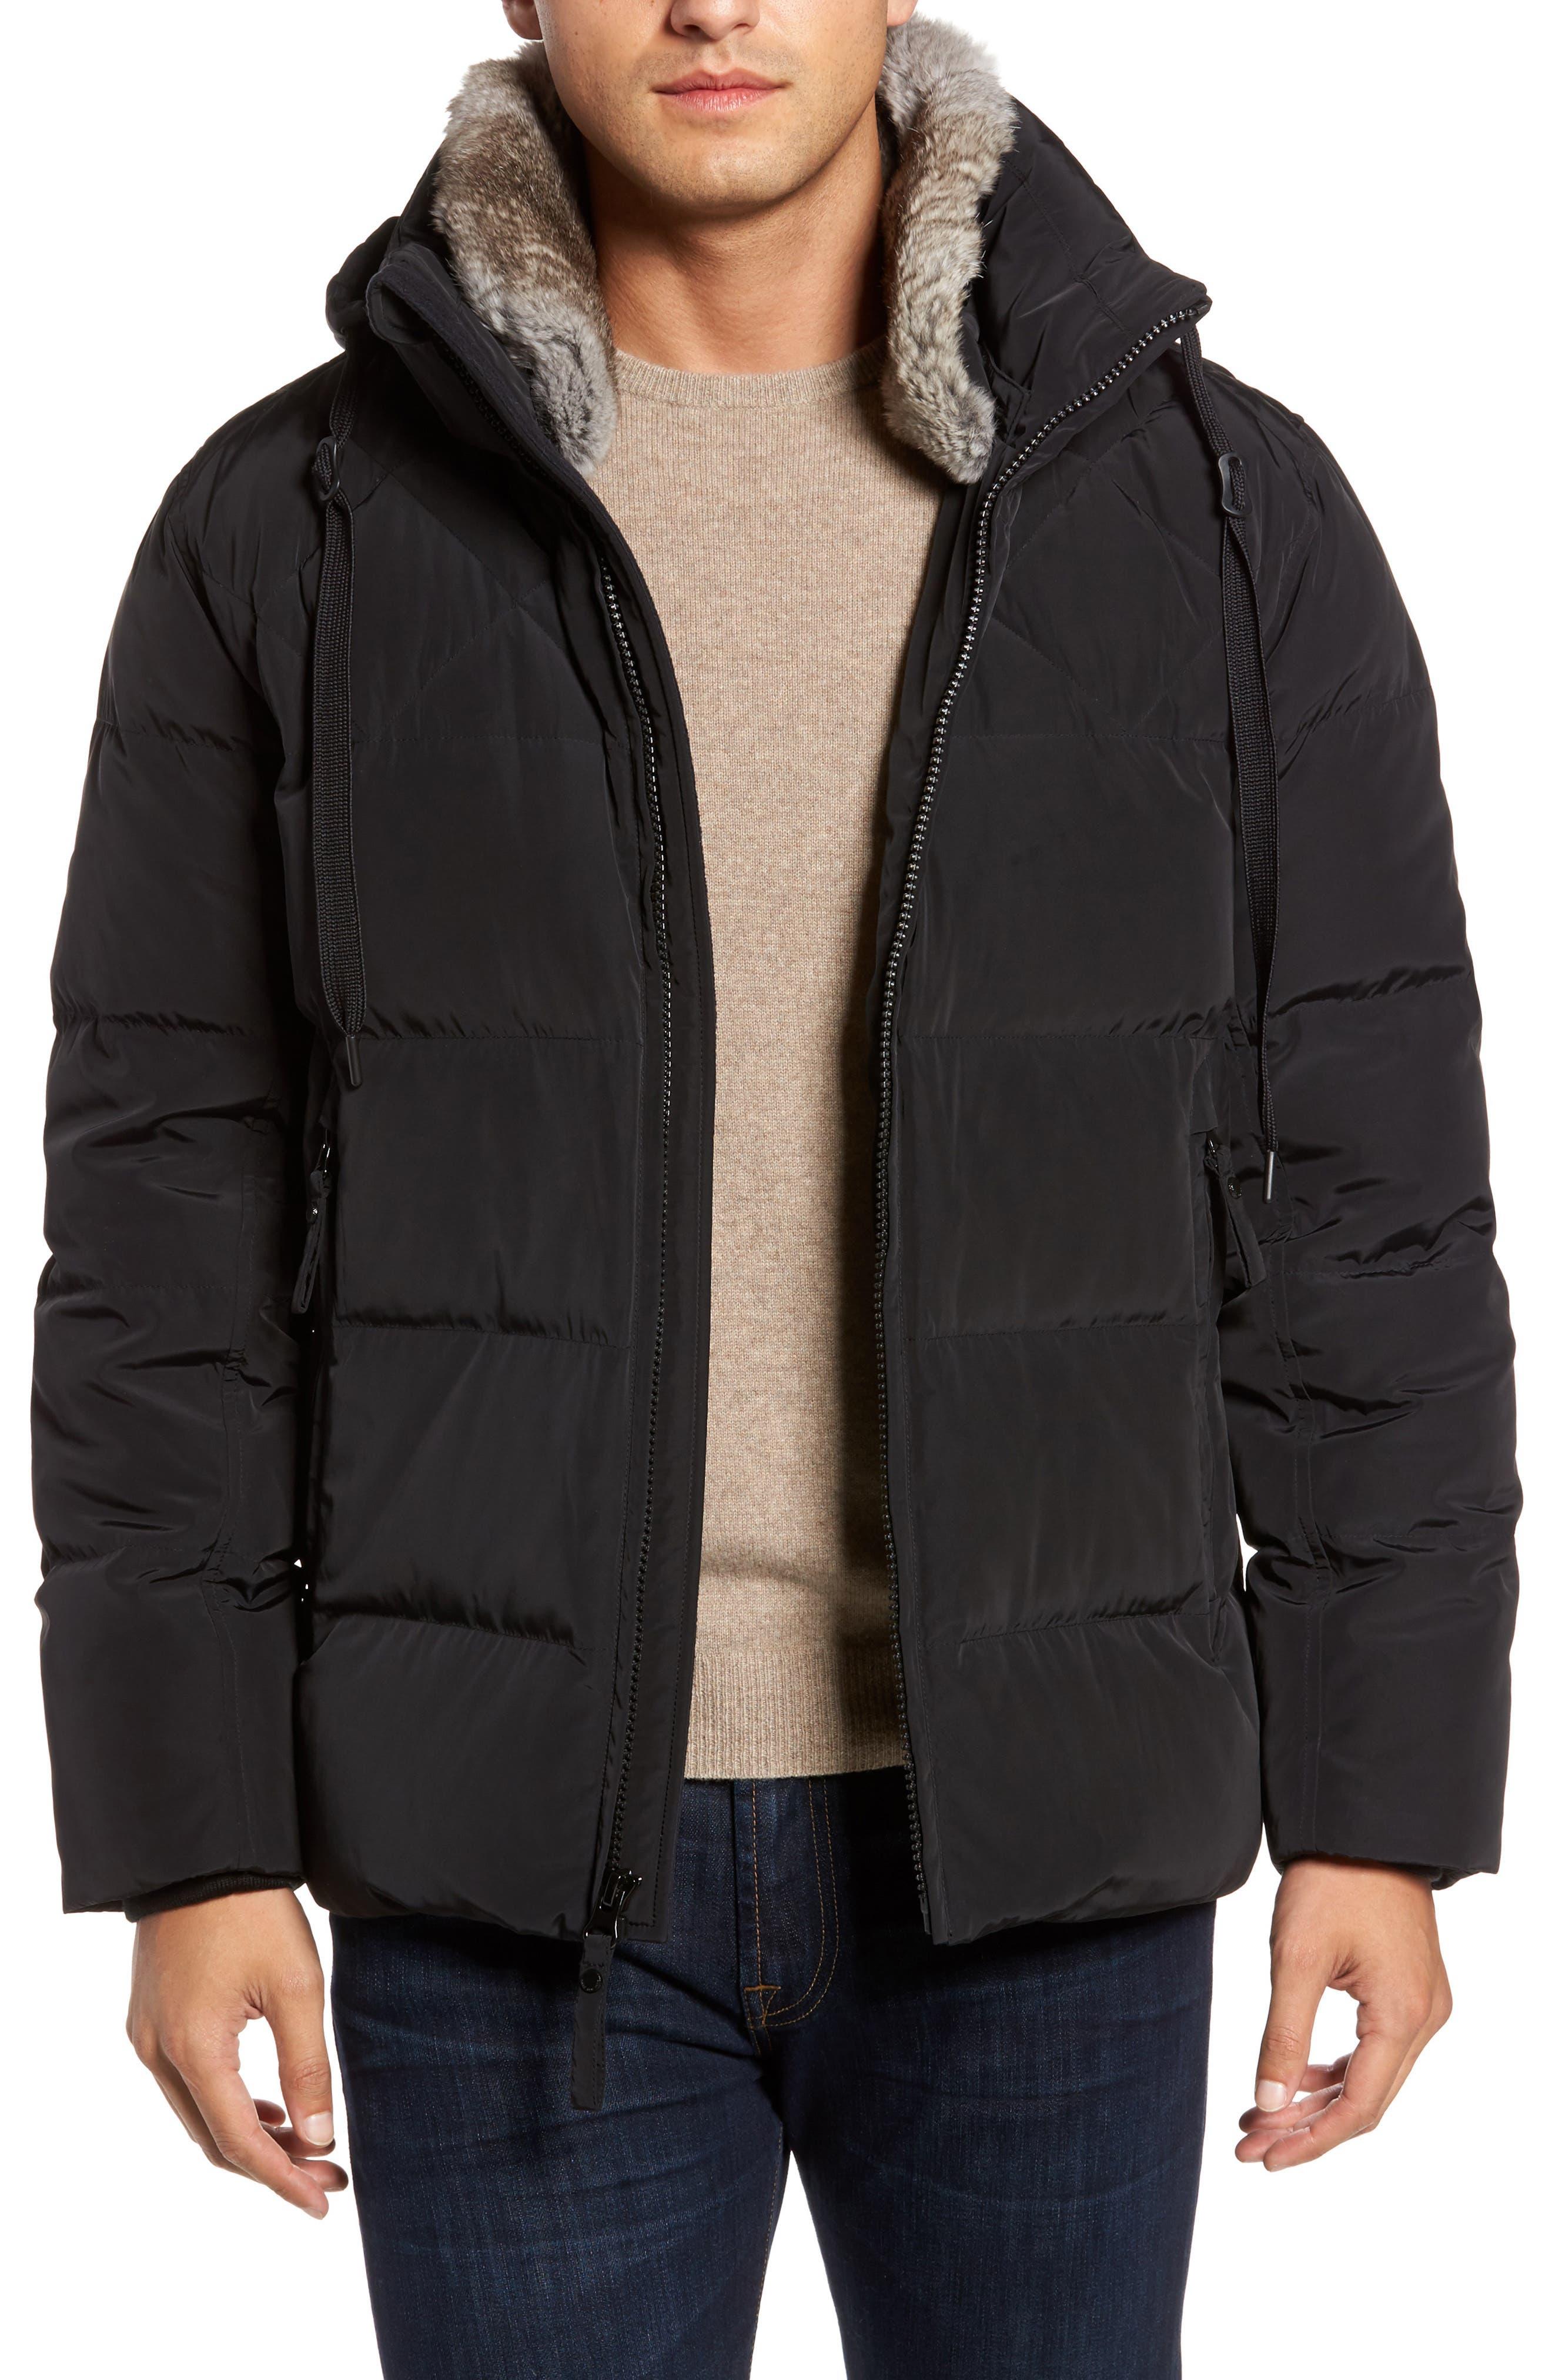 Navan Quilted Down Jacket with Genuine Rabbit Fur Trim,                         Main,                         color, 001